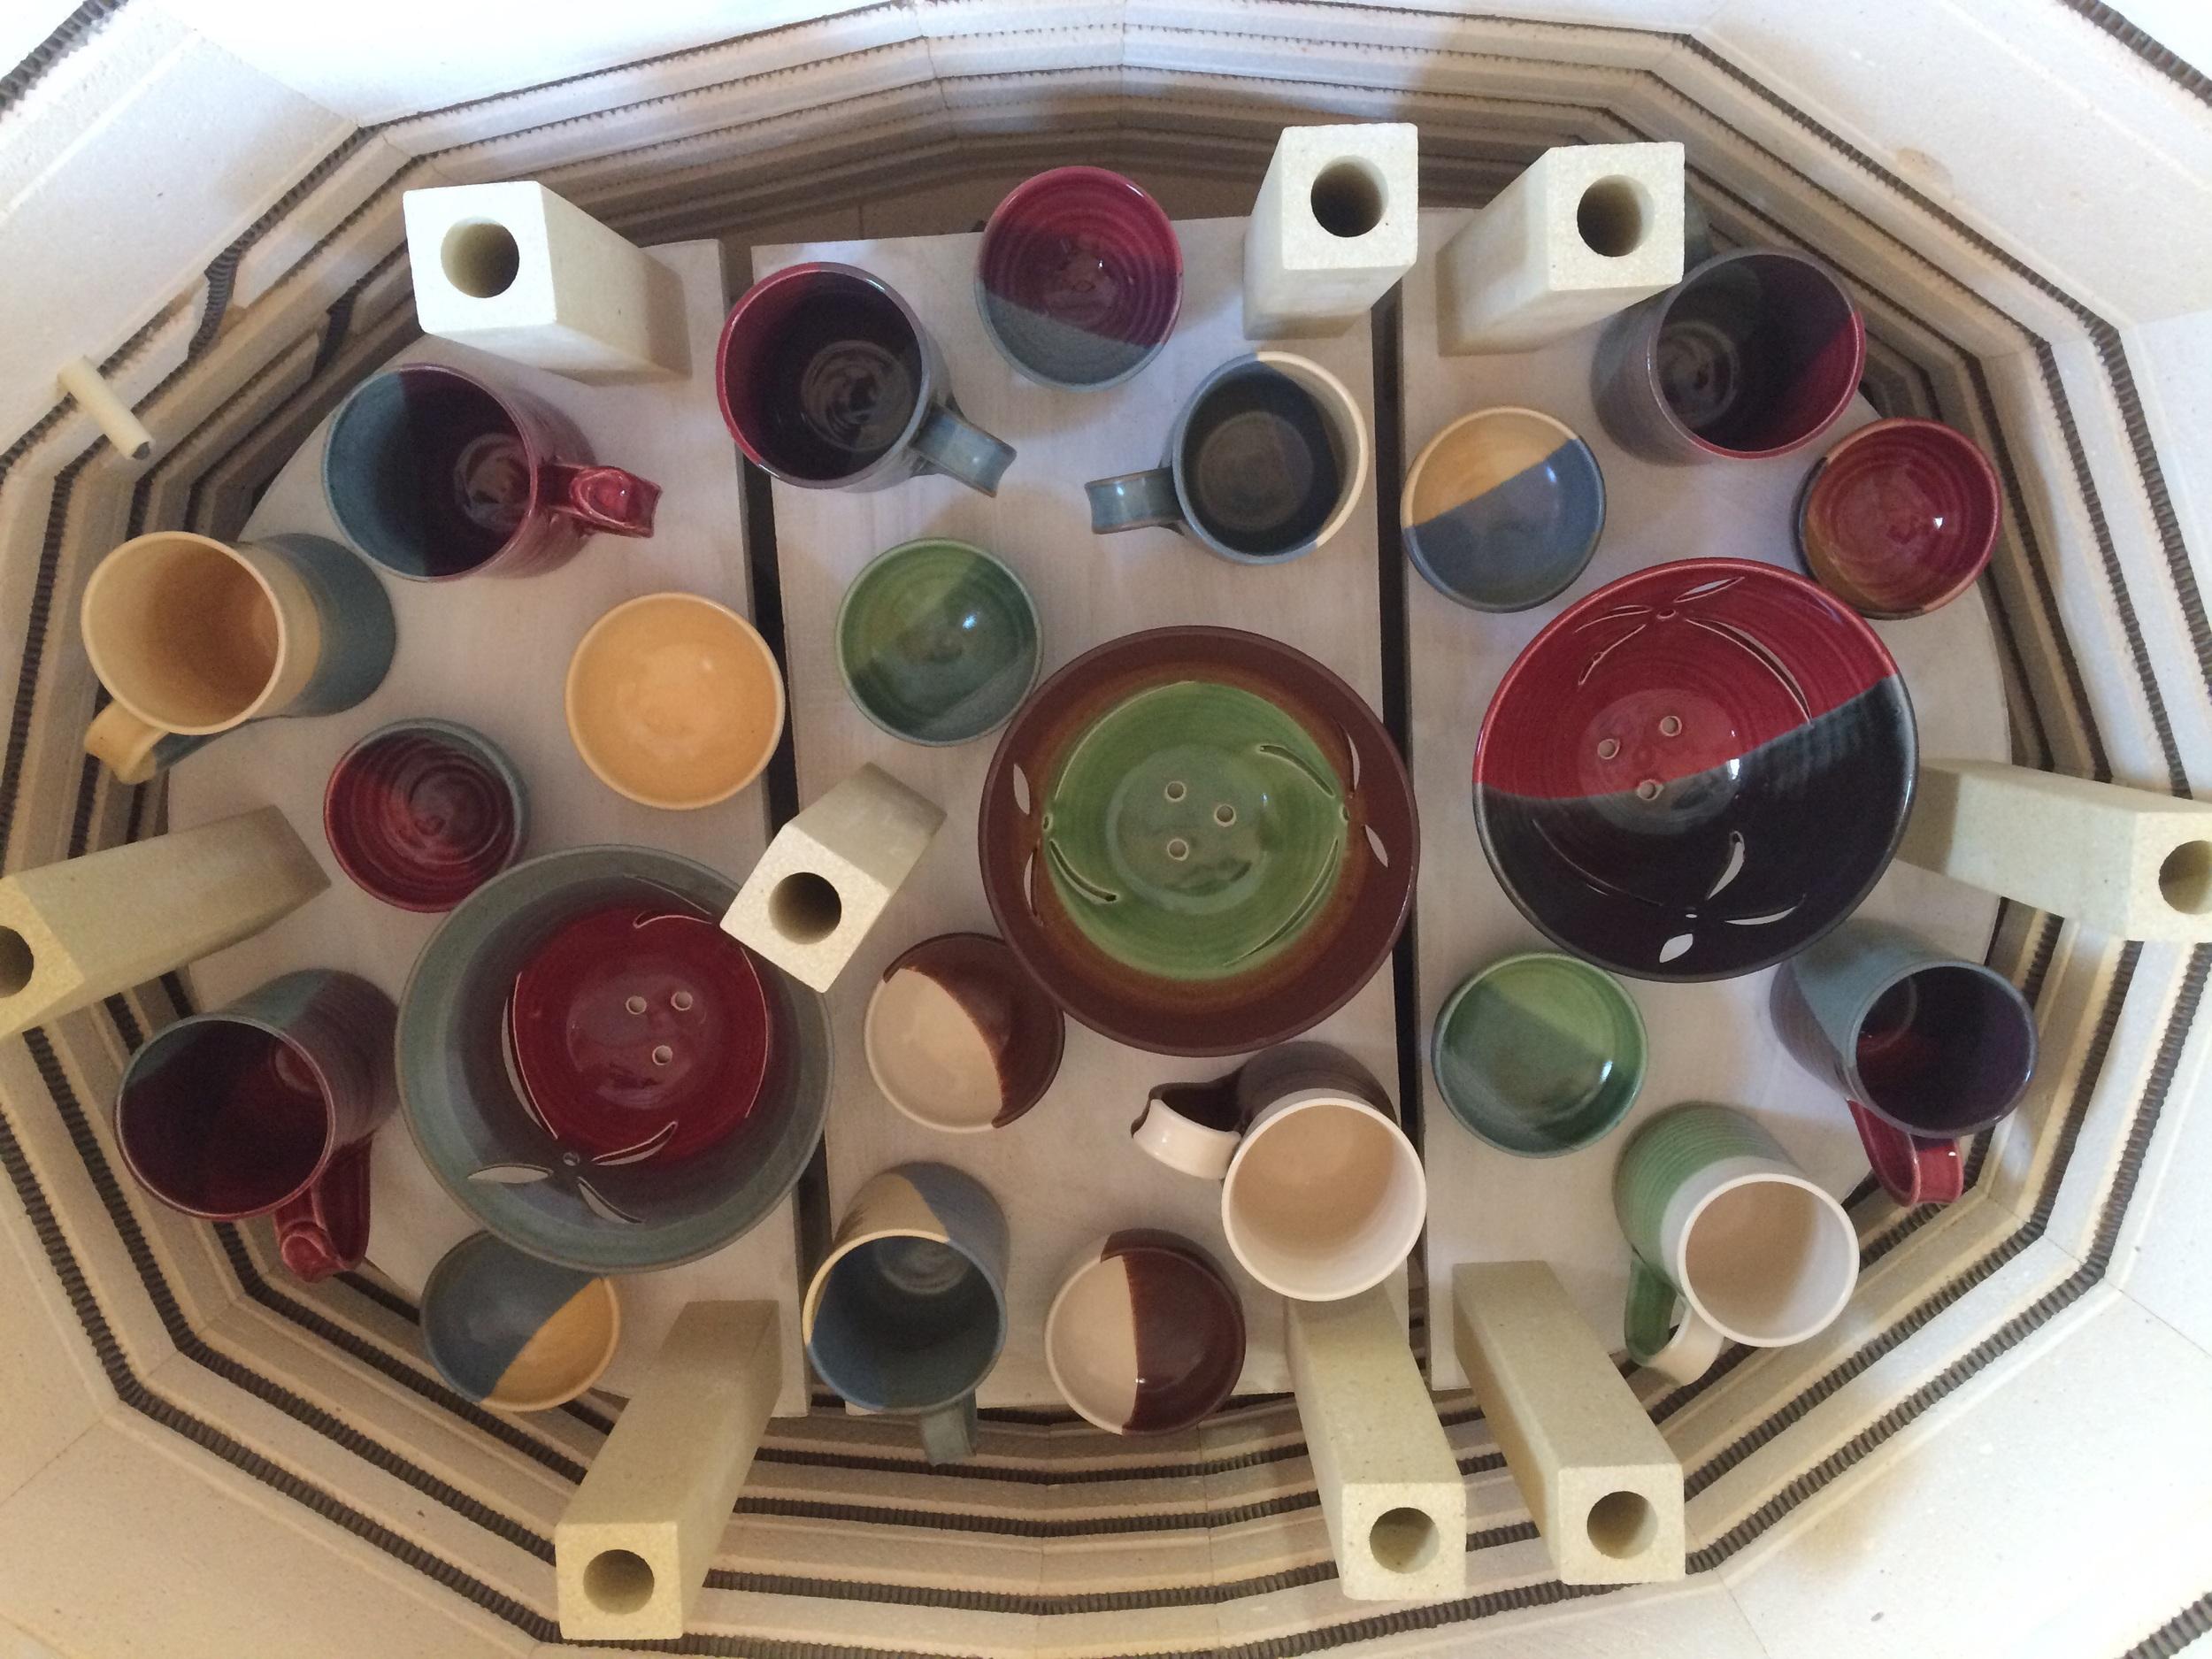 Kiln load of pots